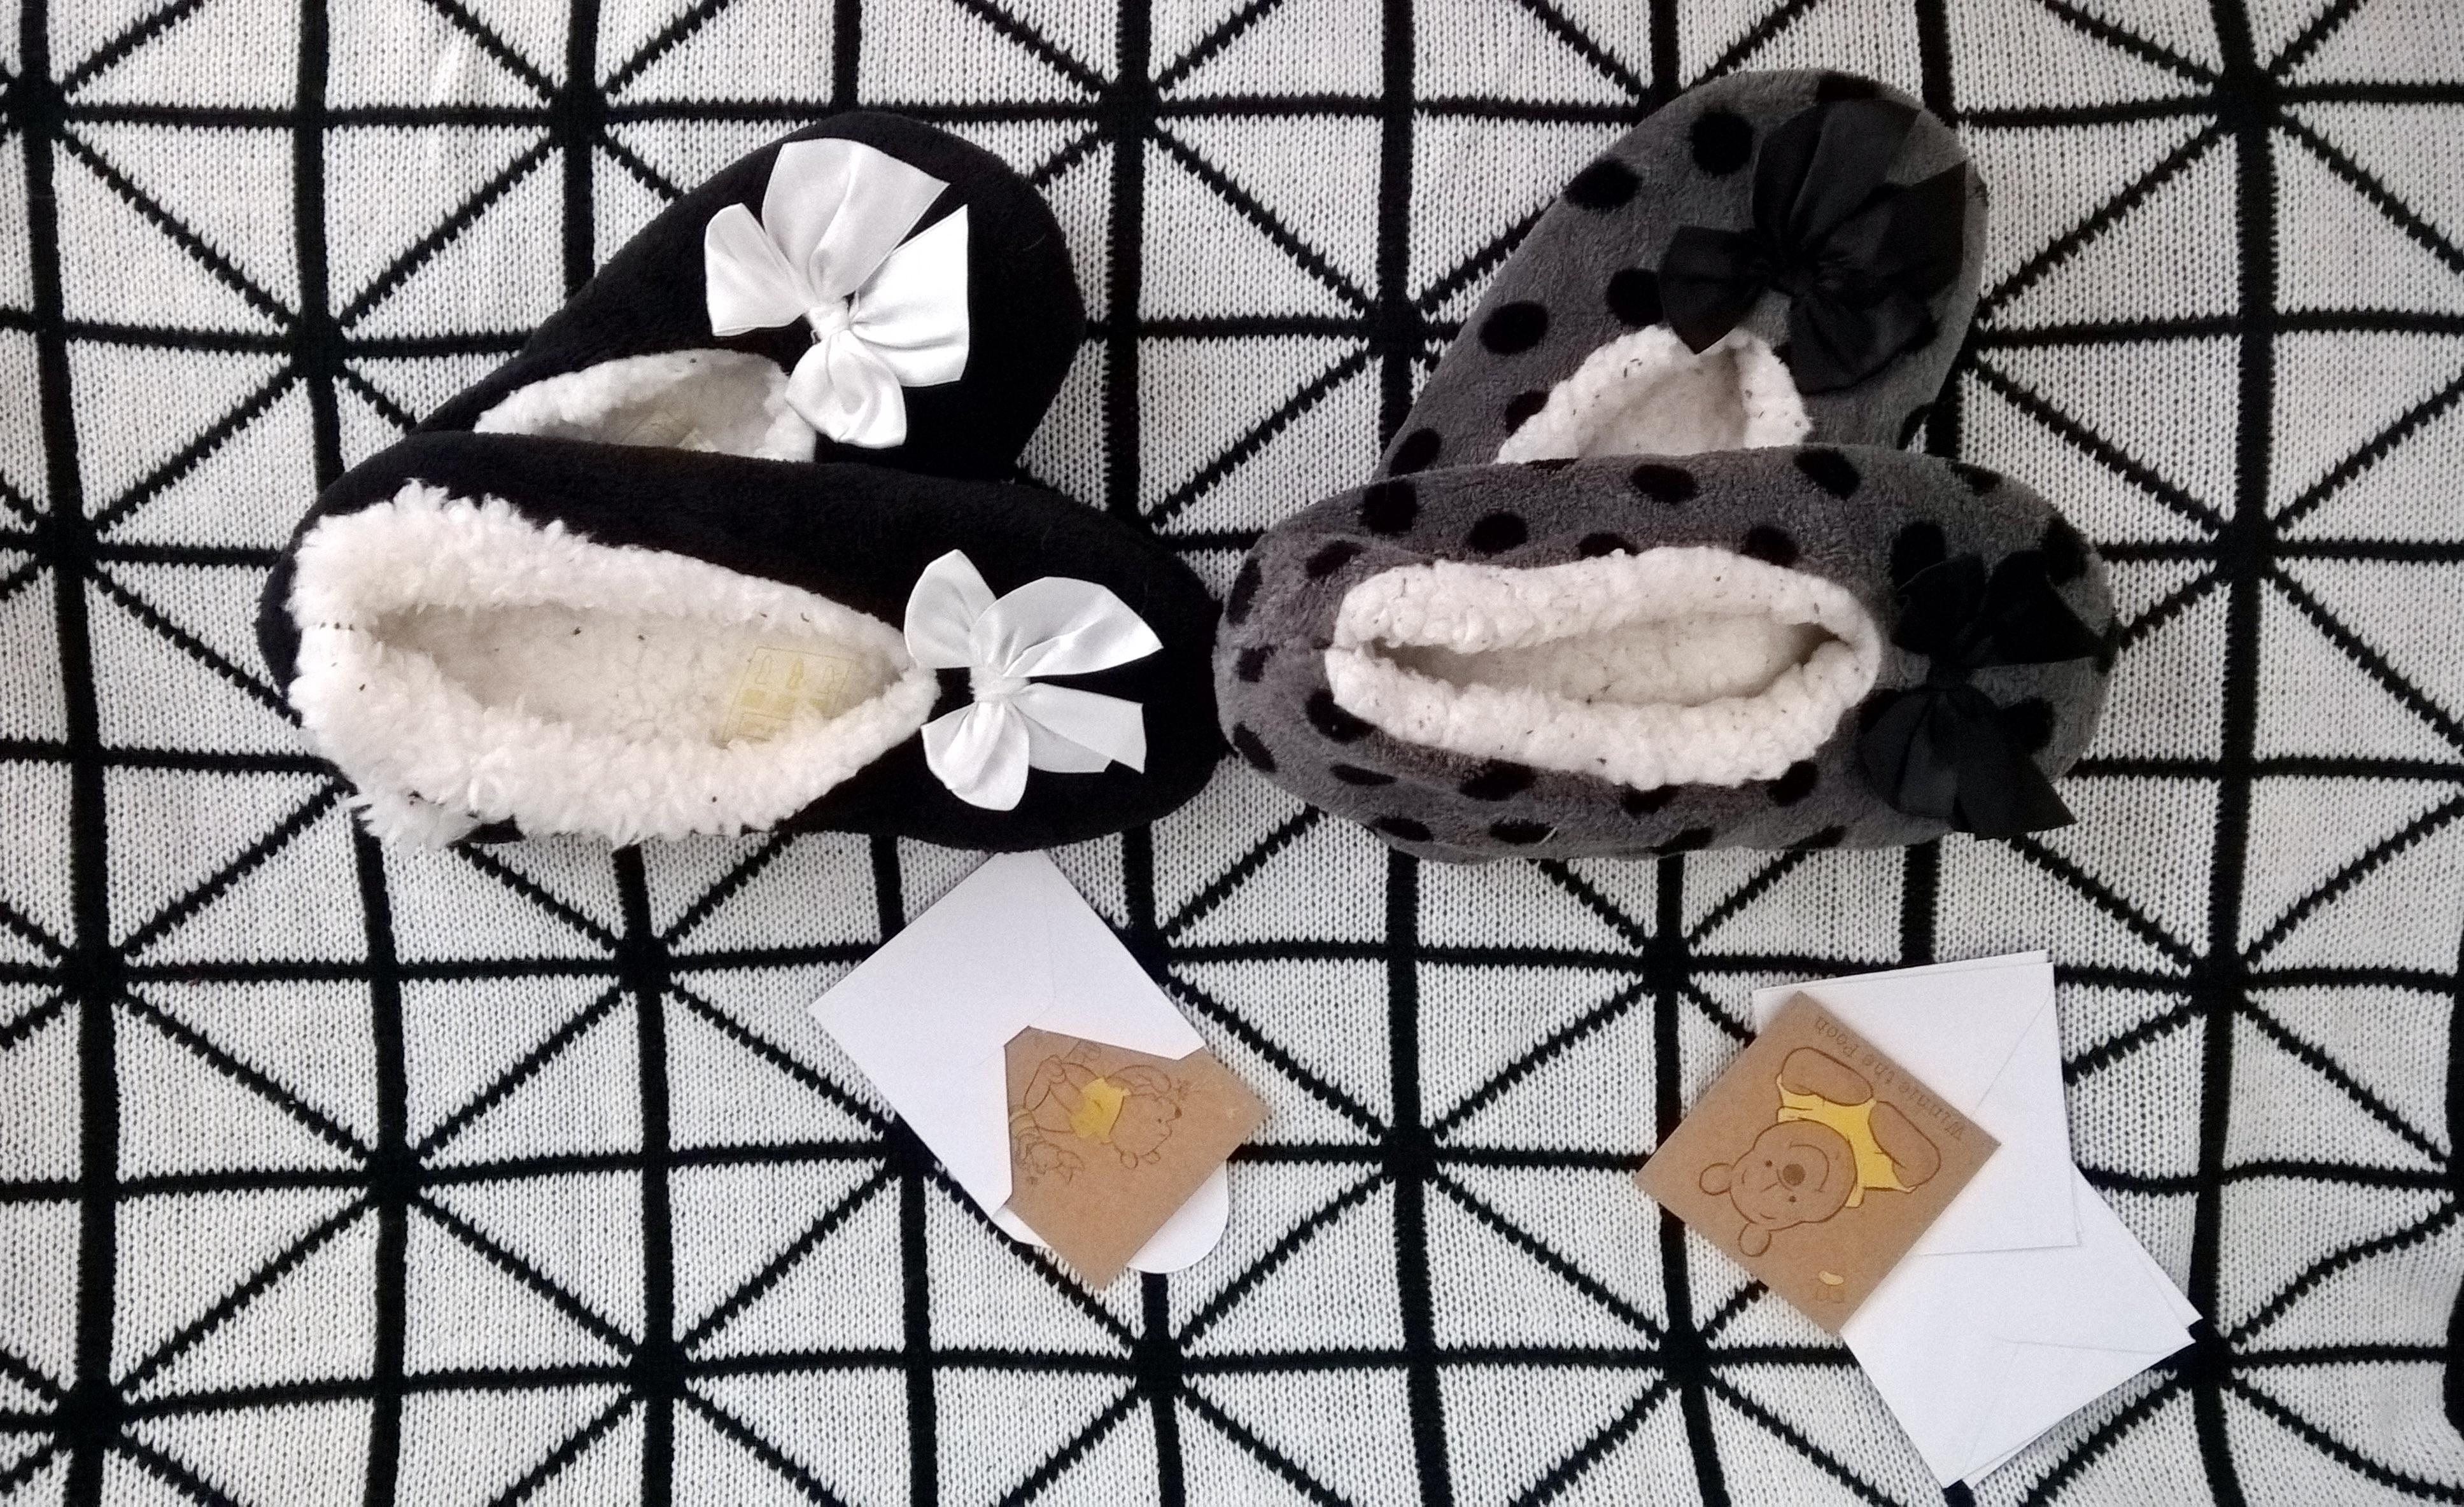 Papier Peint Hicks Hexagon Pas Cher https://leblogdelavieenrouge.wordpress/2018/12/27/les